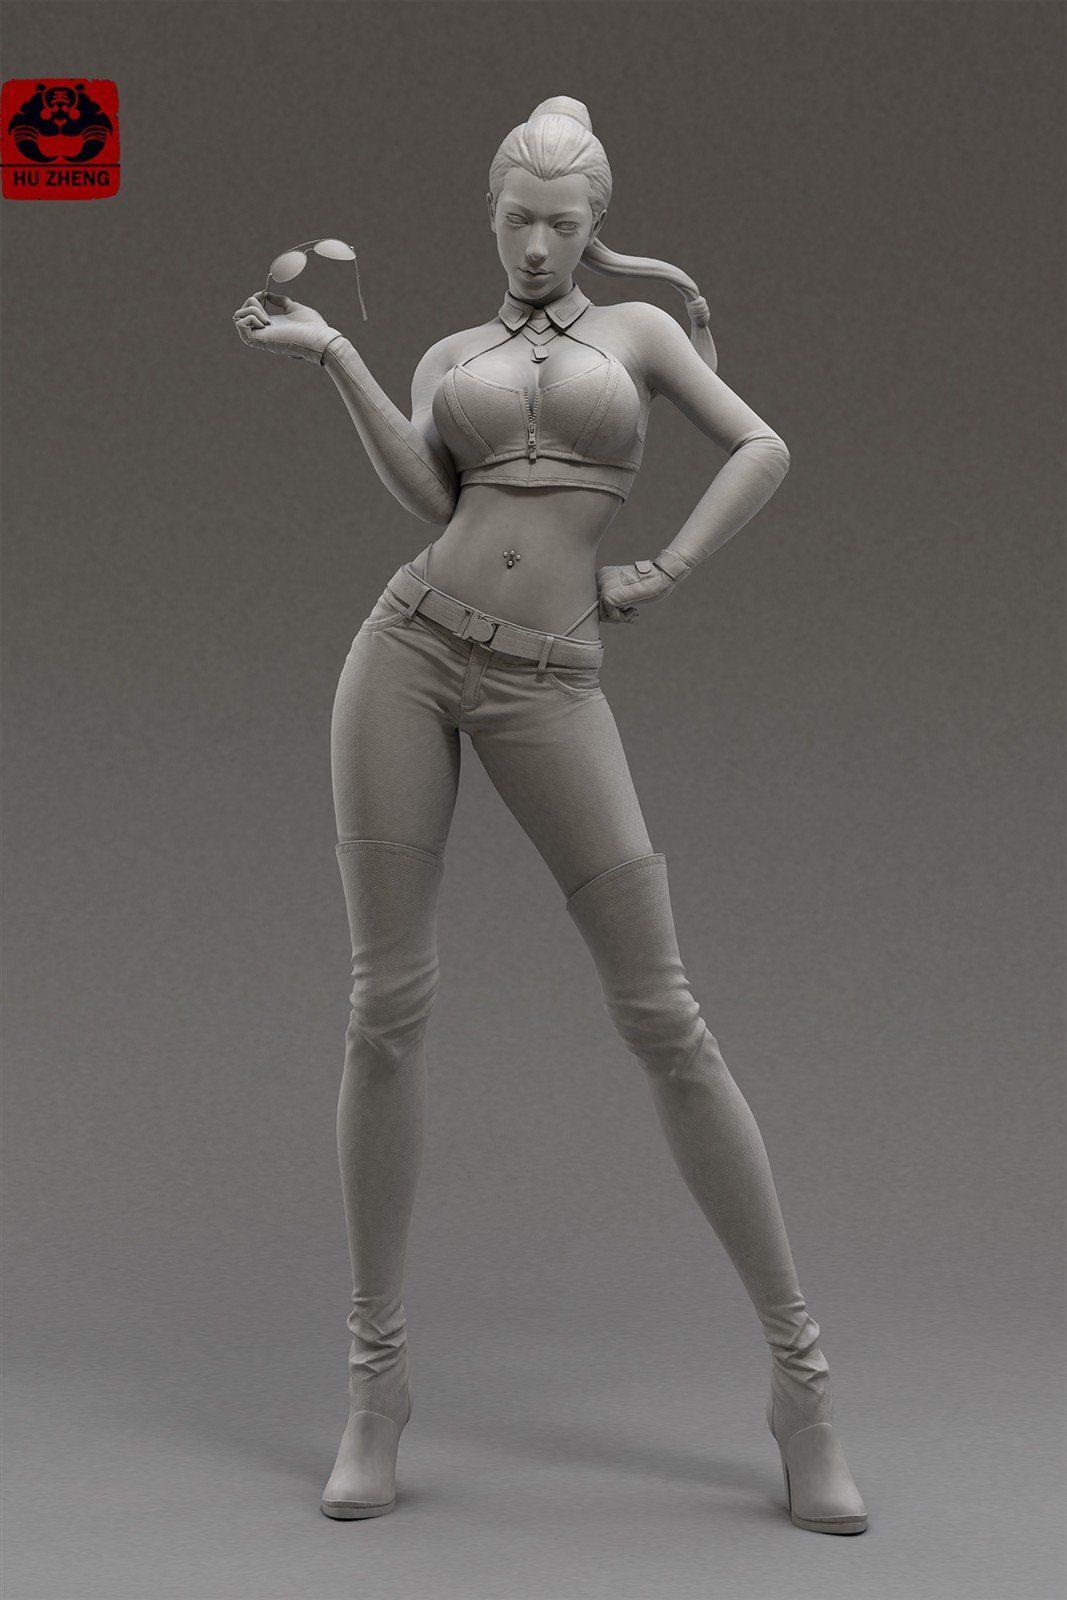 https://www.artstation.com/artwork/zbrush-sculpt-6de0ffbf-571f-4fa3 ...